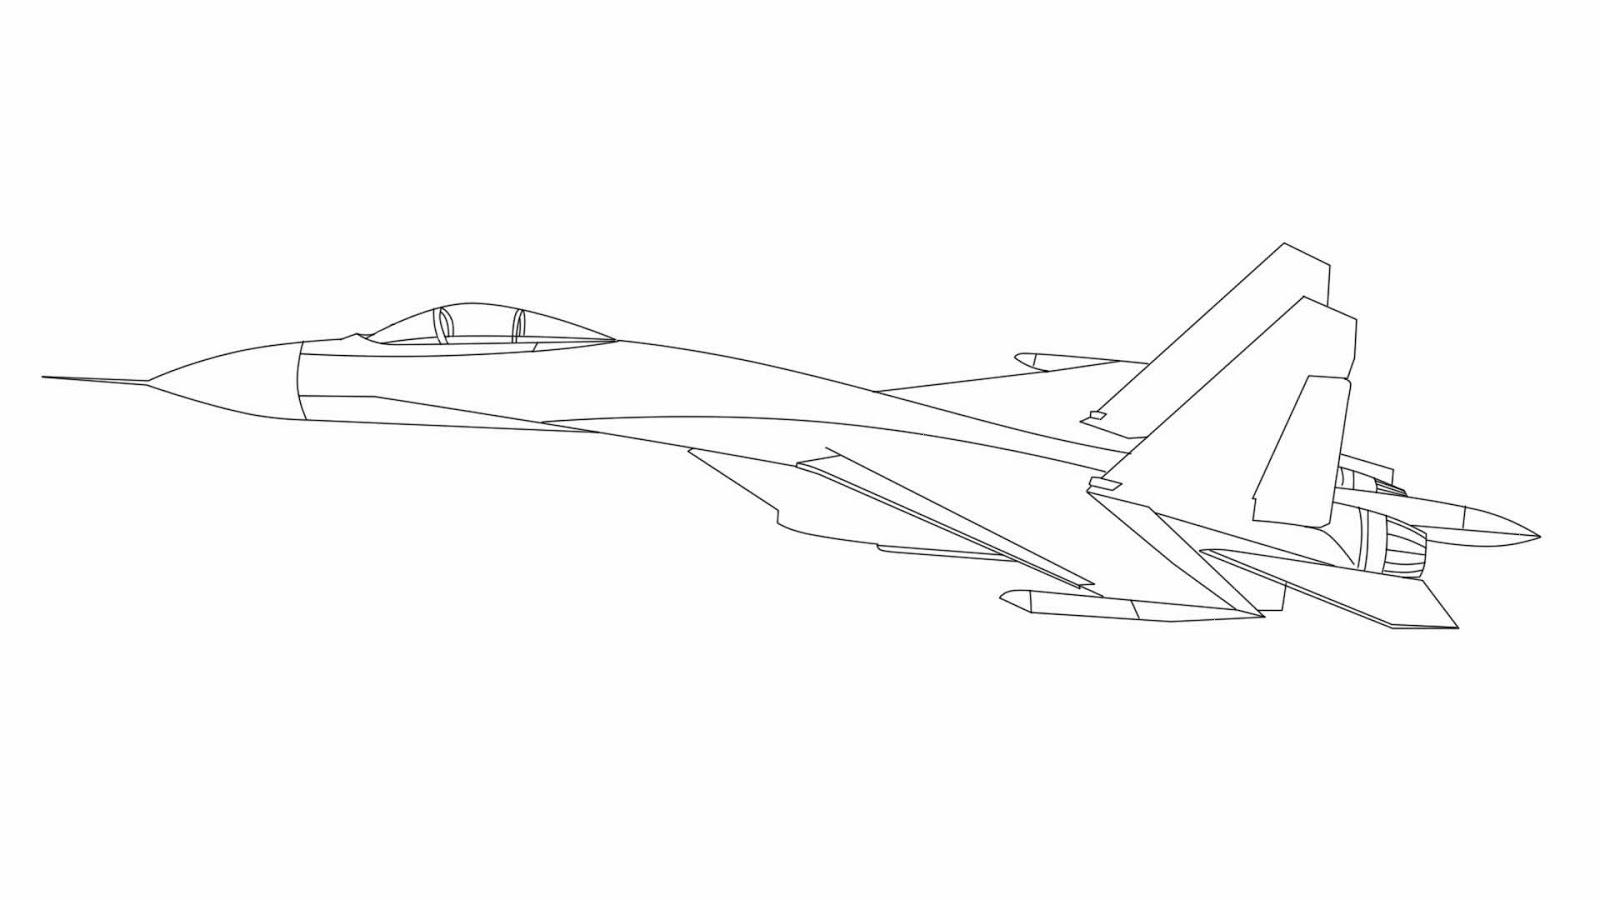 Koleksi Gambar Sketsa Pesawat Jet